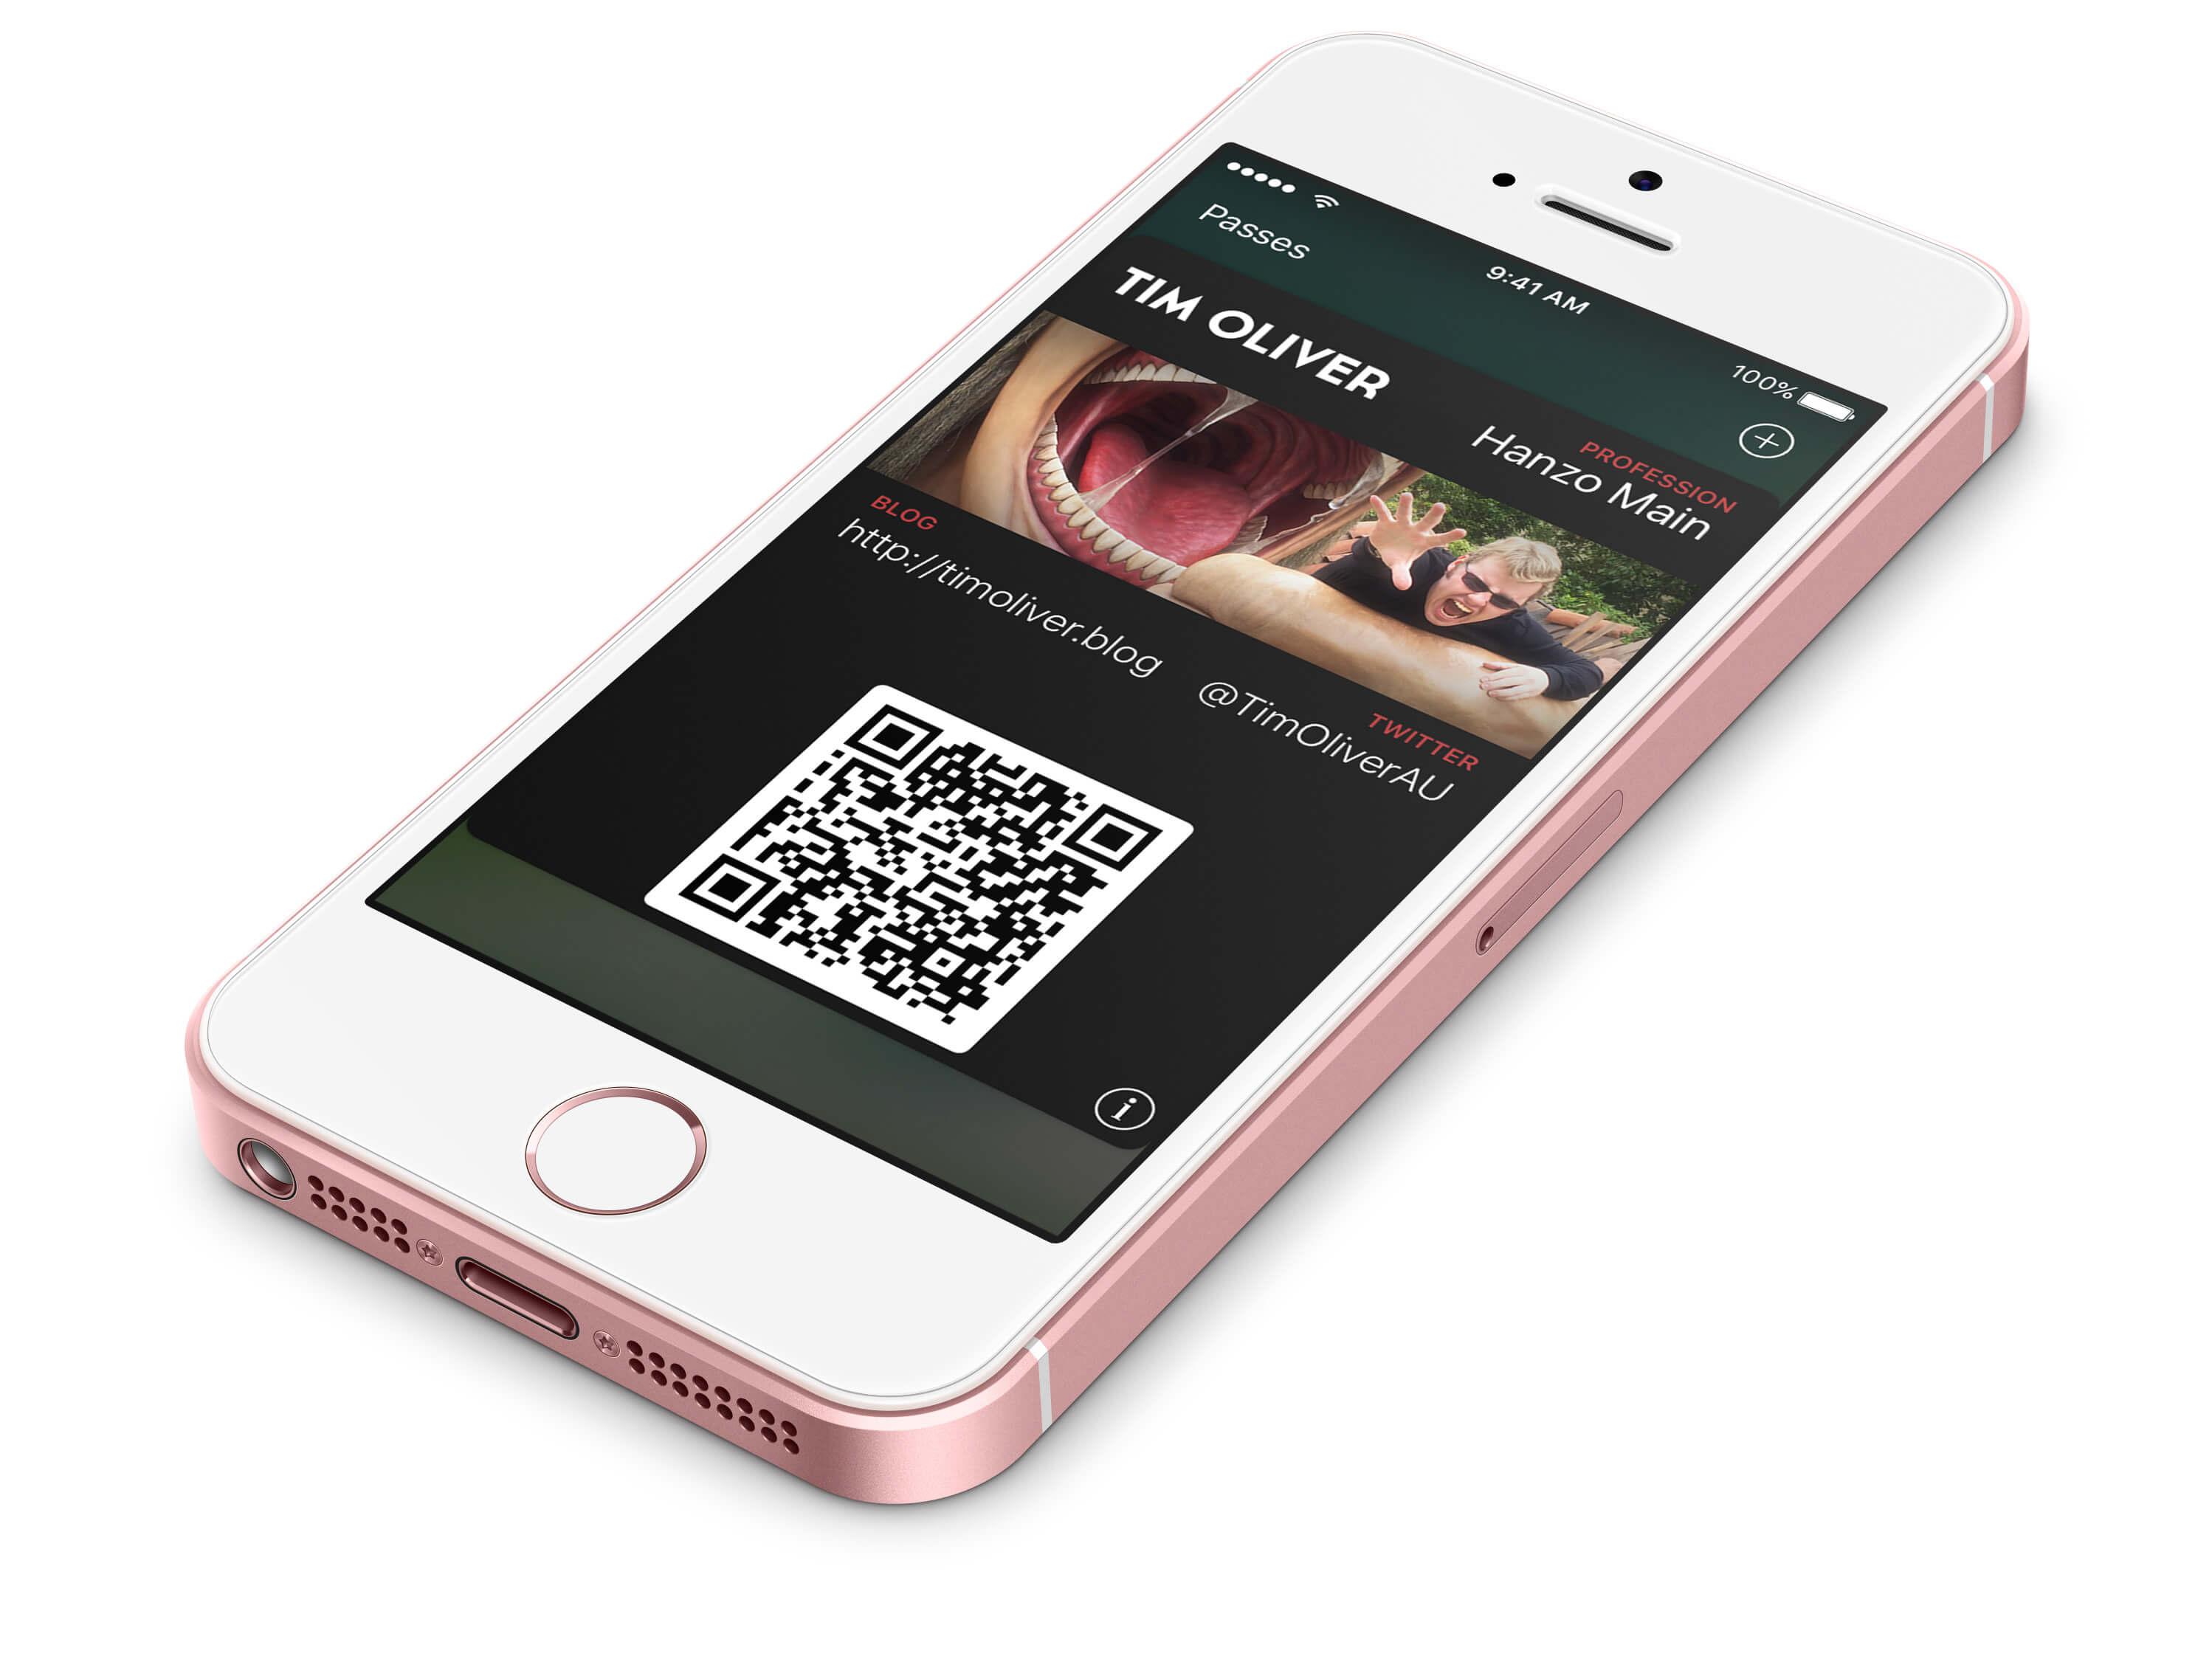 Github - Timoliver/passkit-Business-Card: A Template For Ios within Iphone Business Card Template